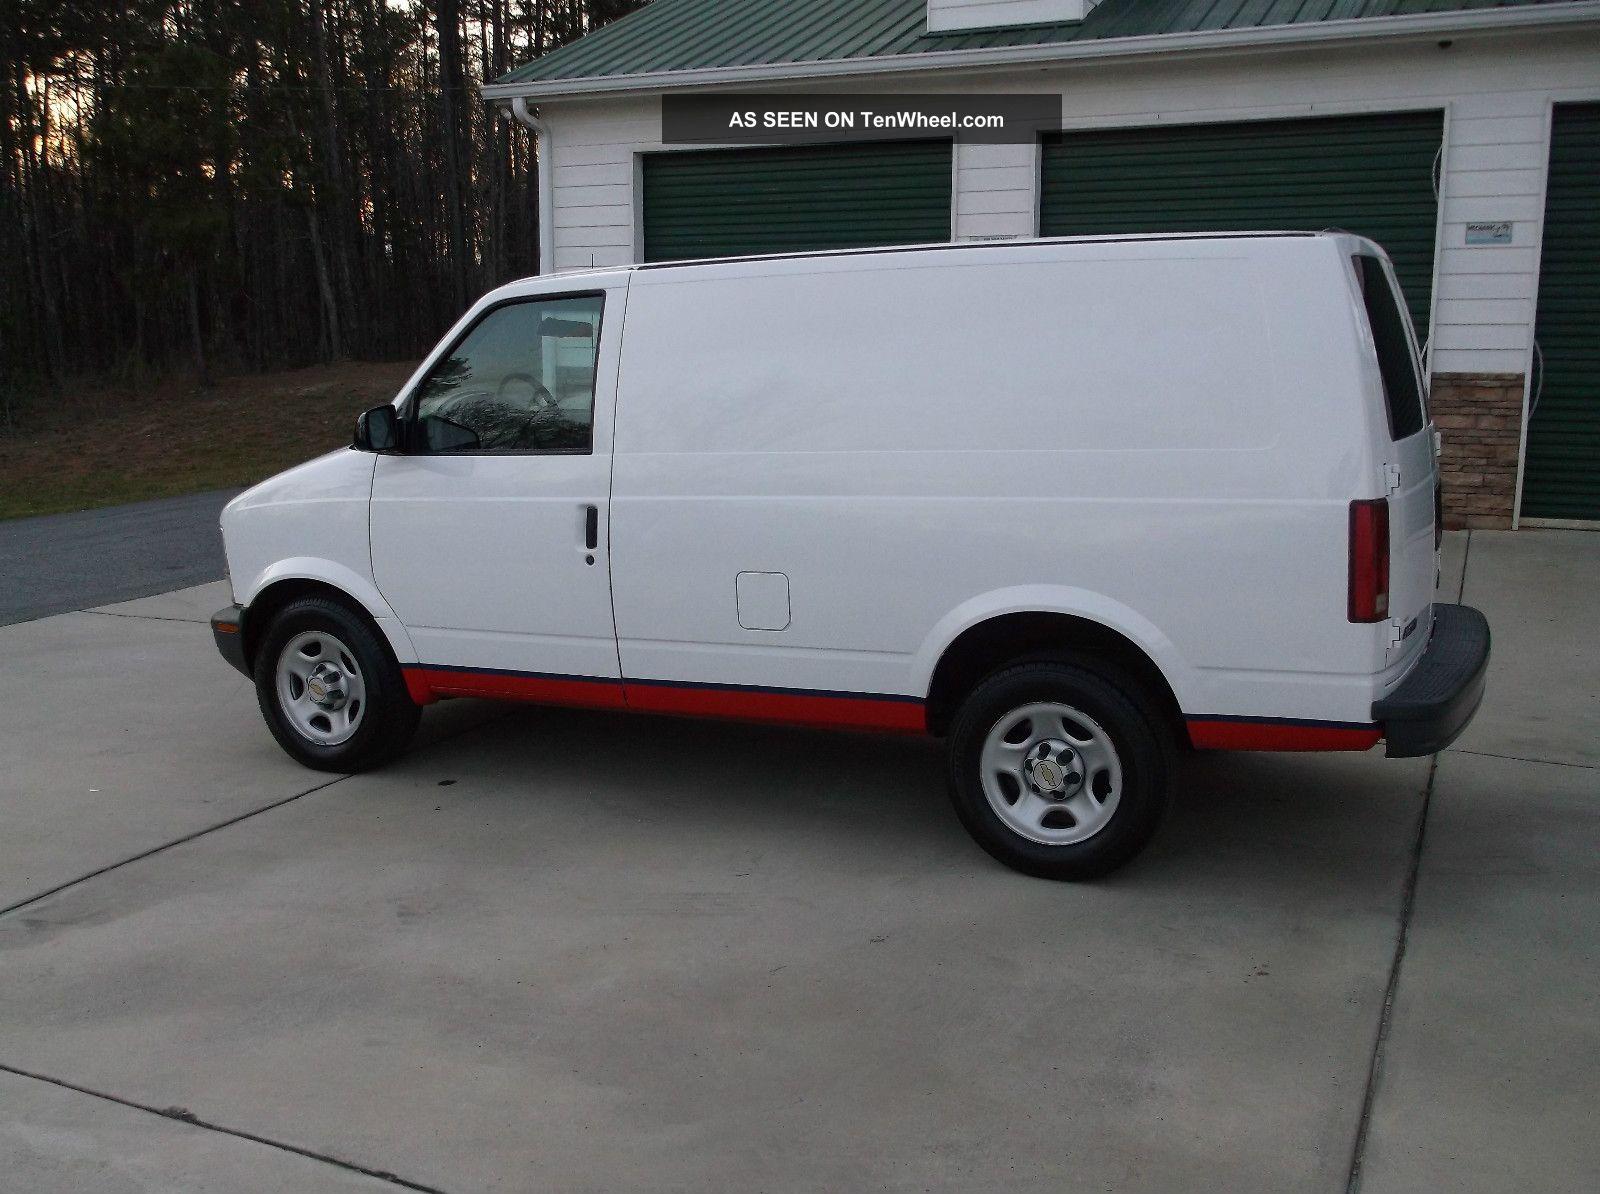 2004 Chevrolet Astro Cargo Image 6